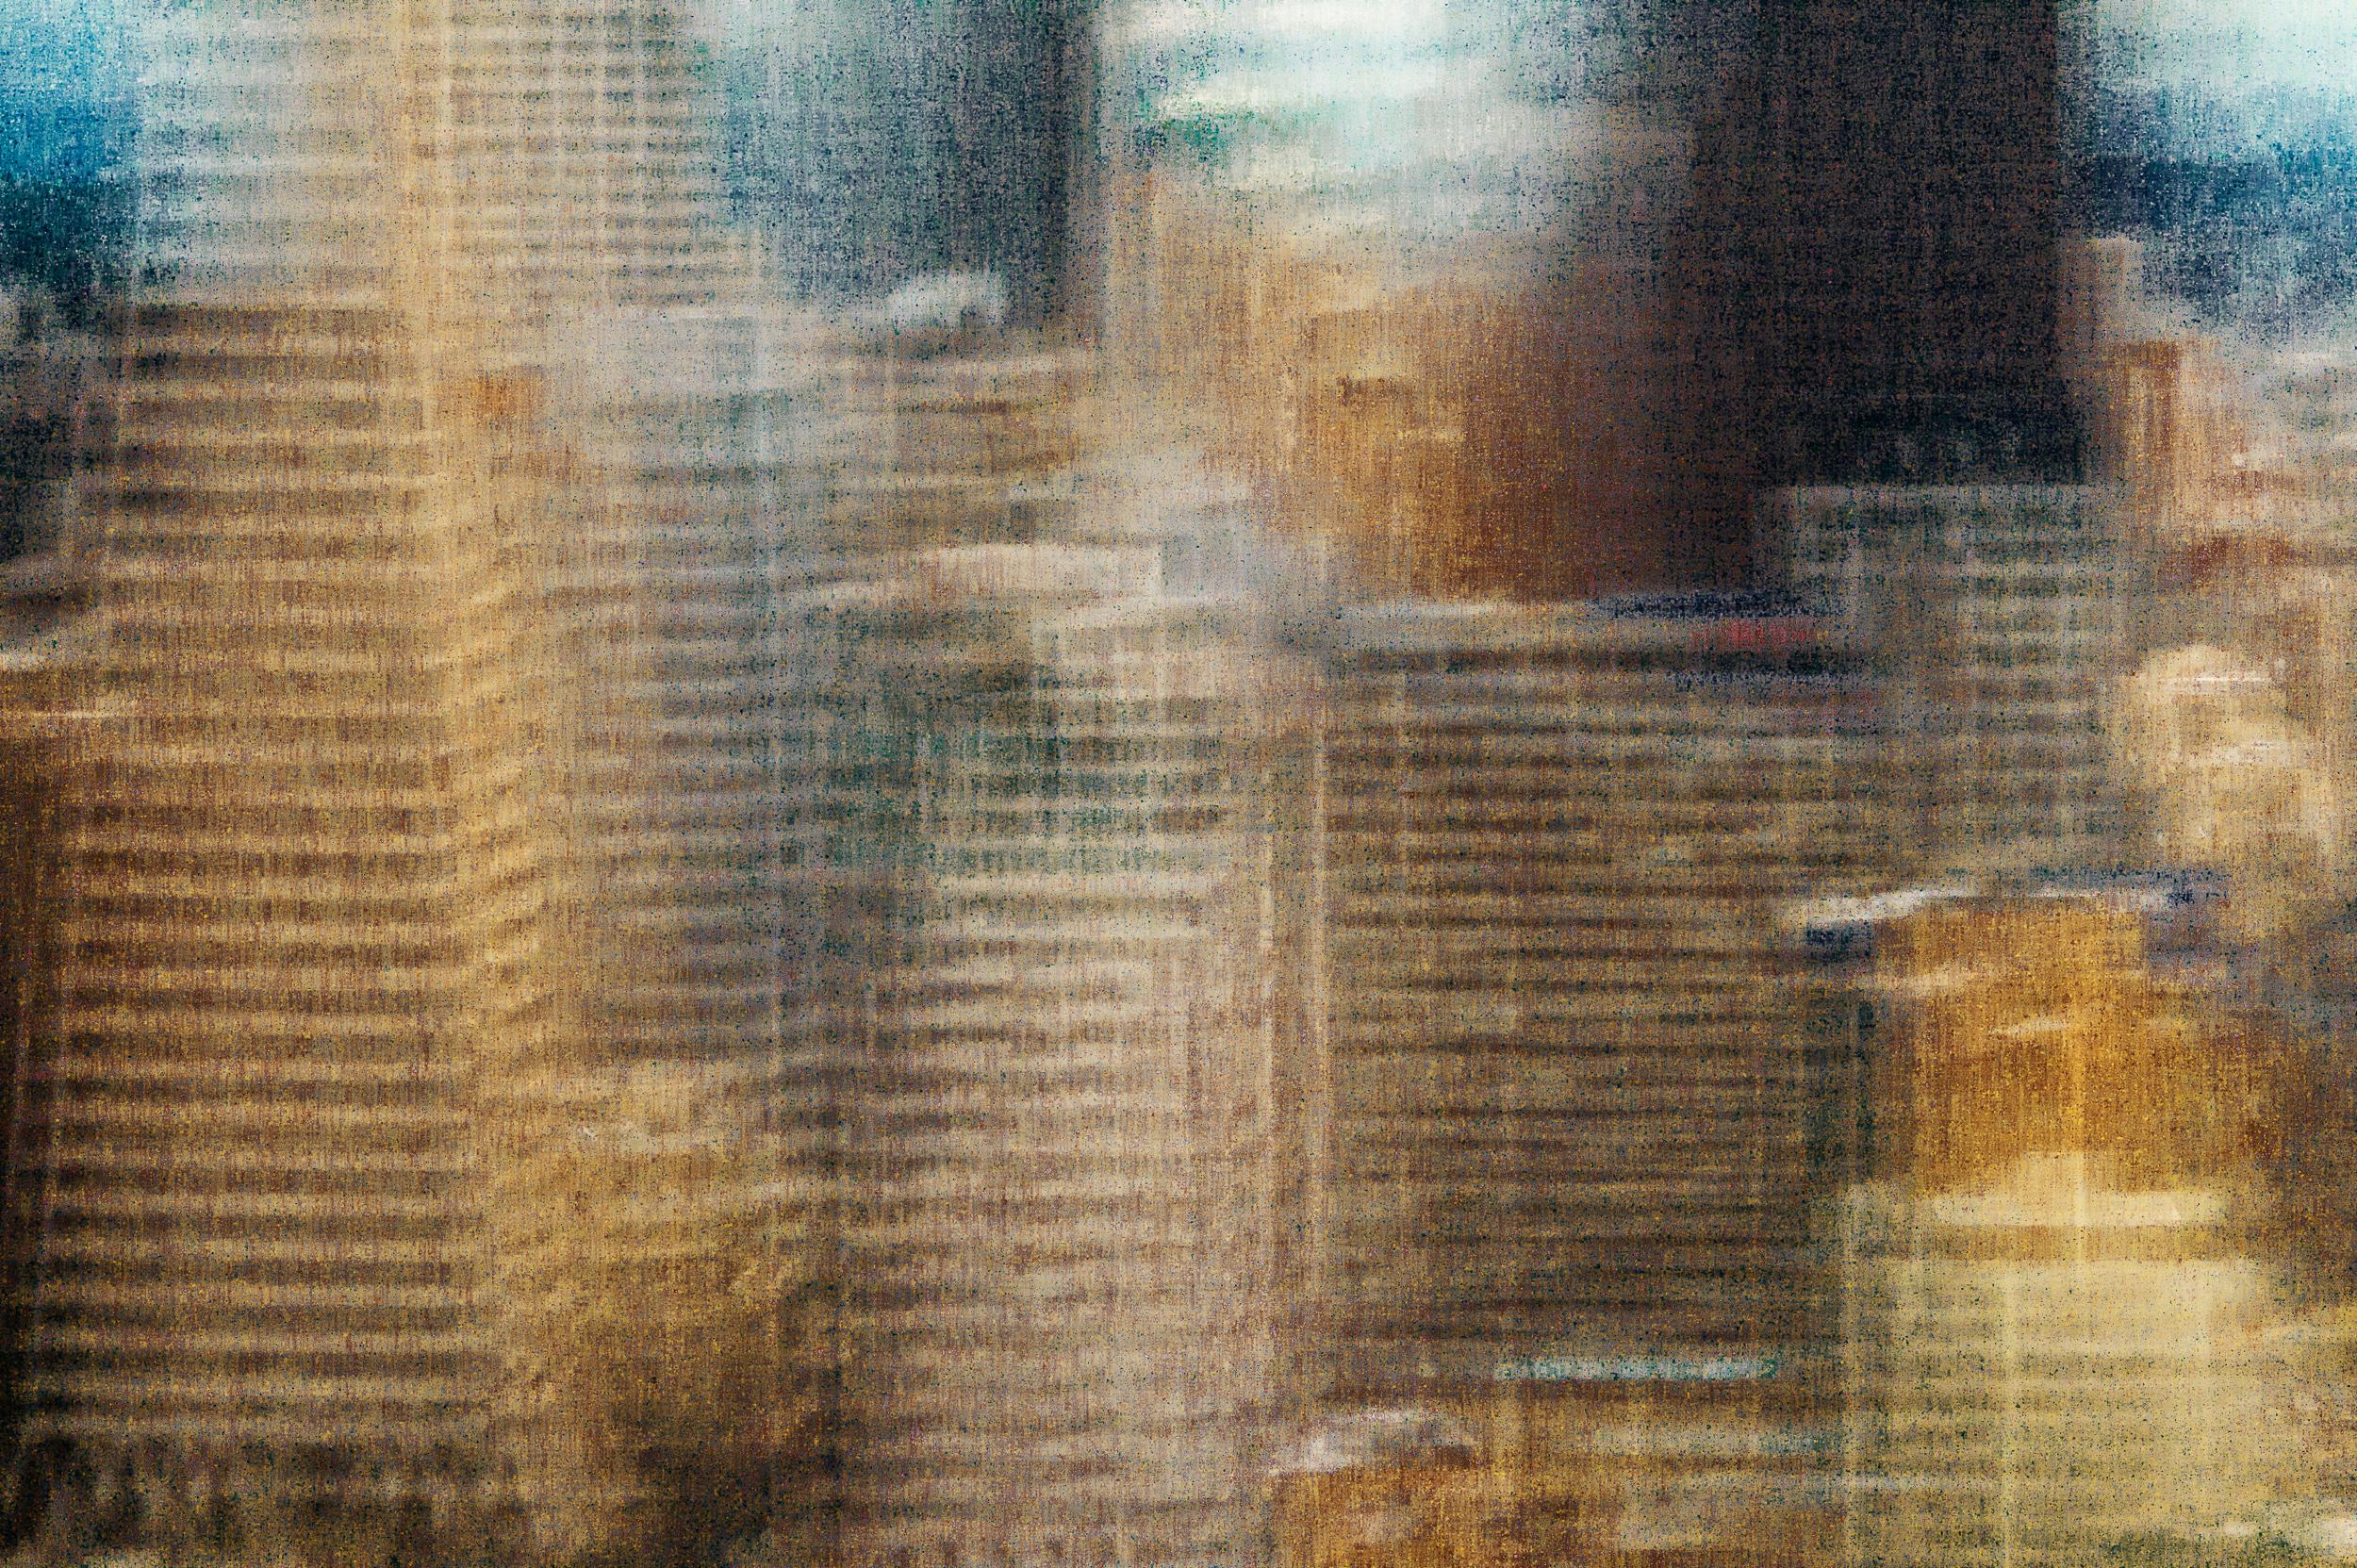 cityscape no 1368